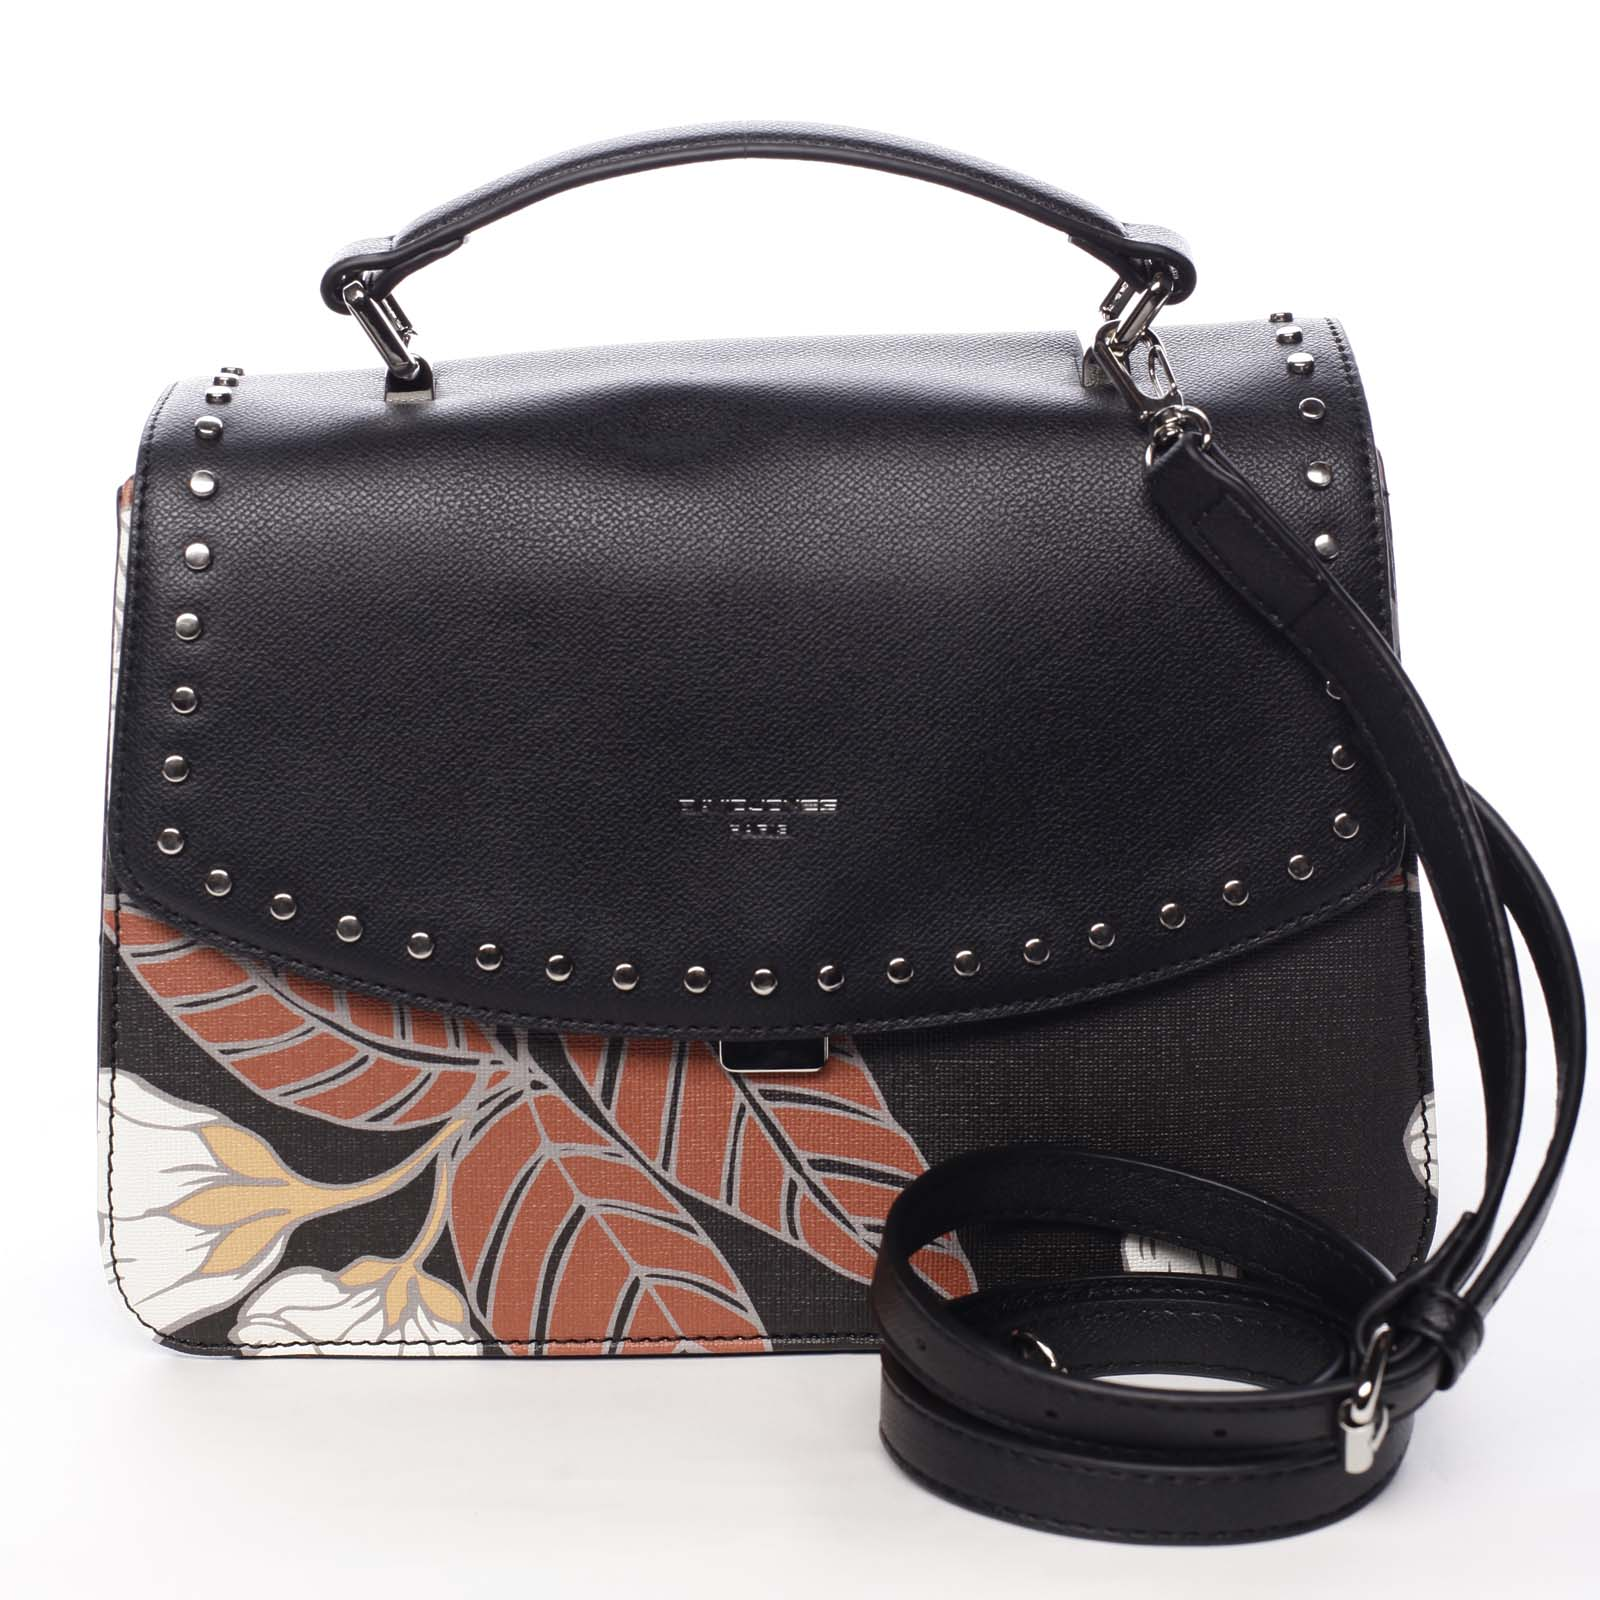 Dámska kabelka do ruky čierna - David Jones Floral čierna